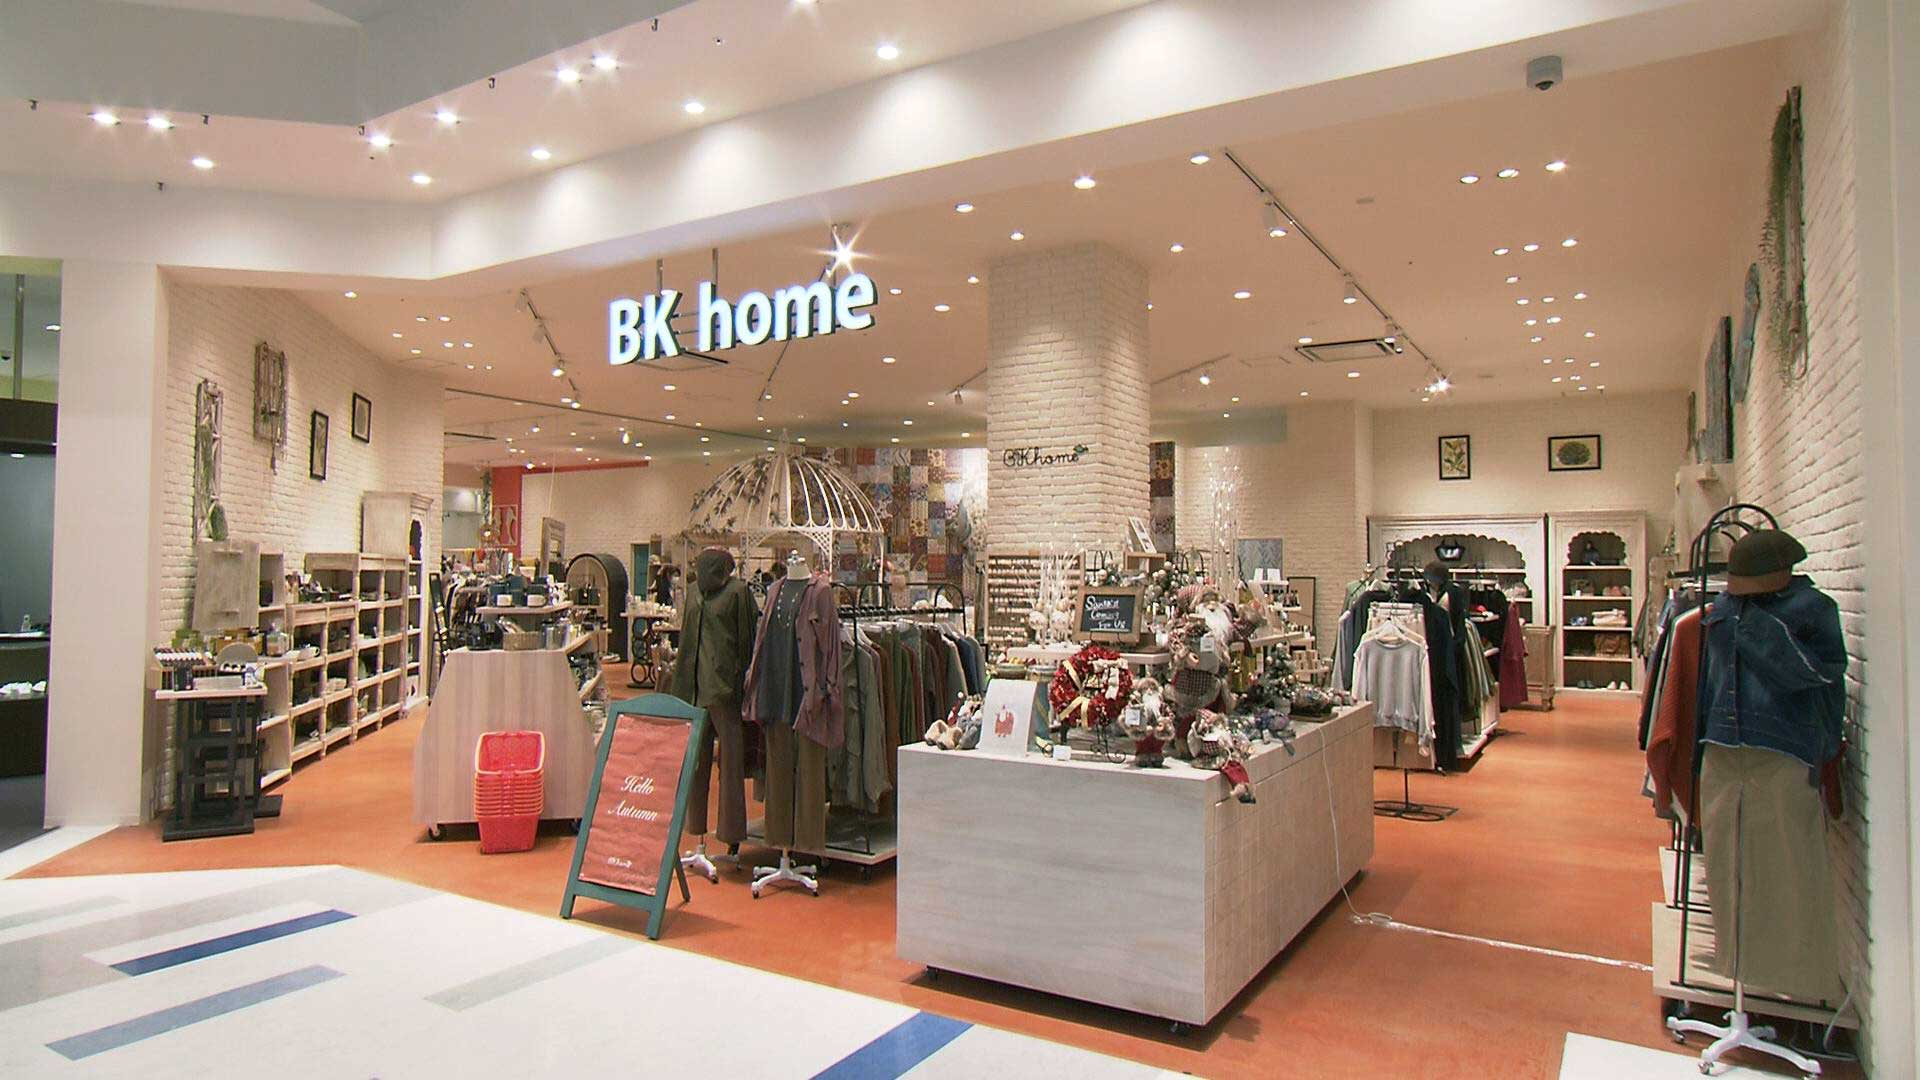 BK home